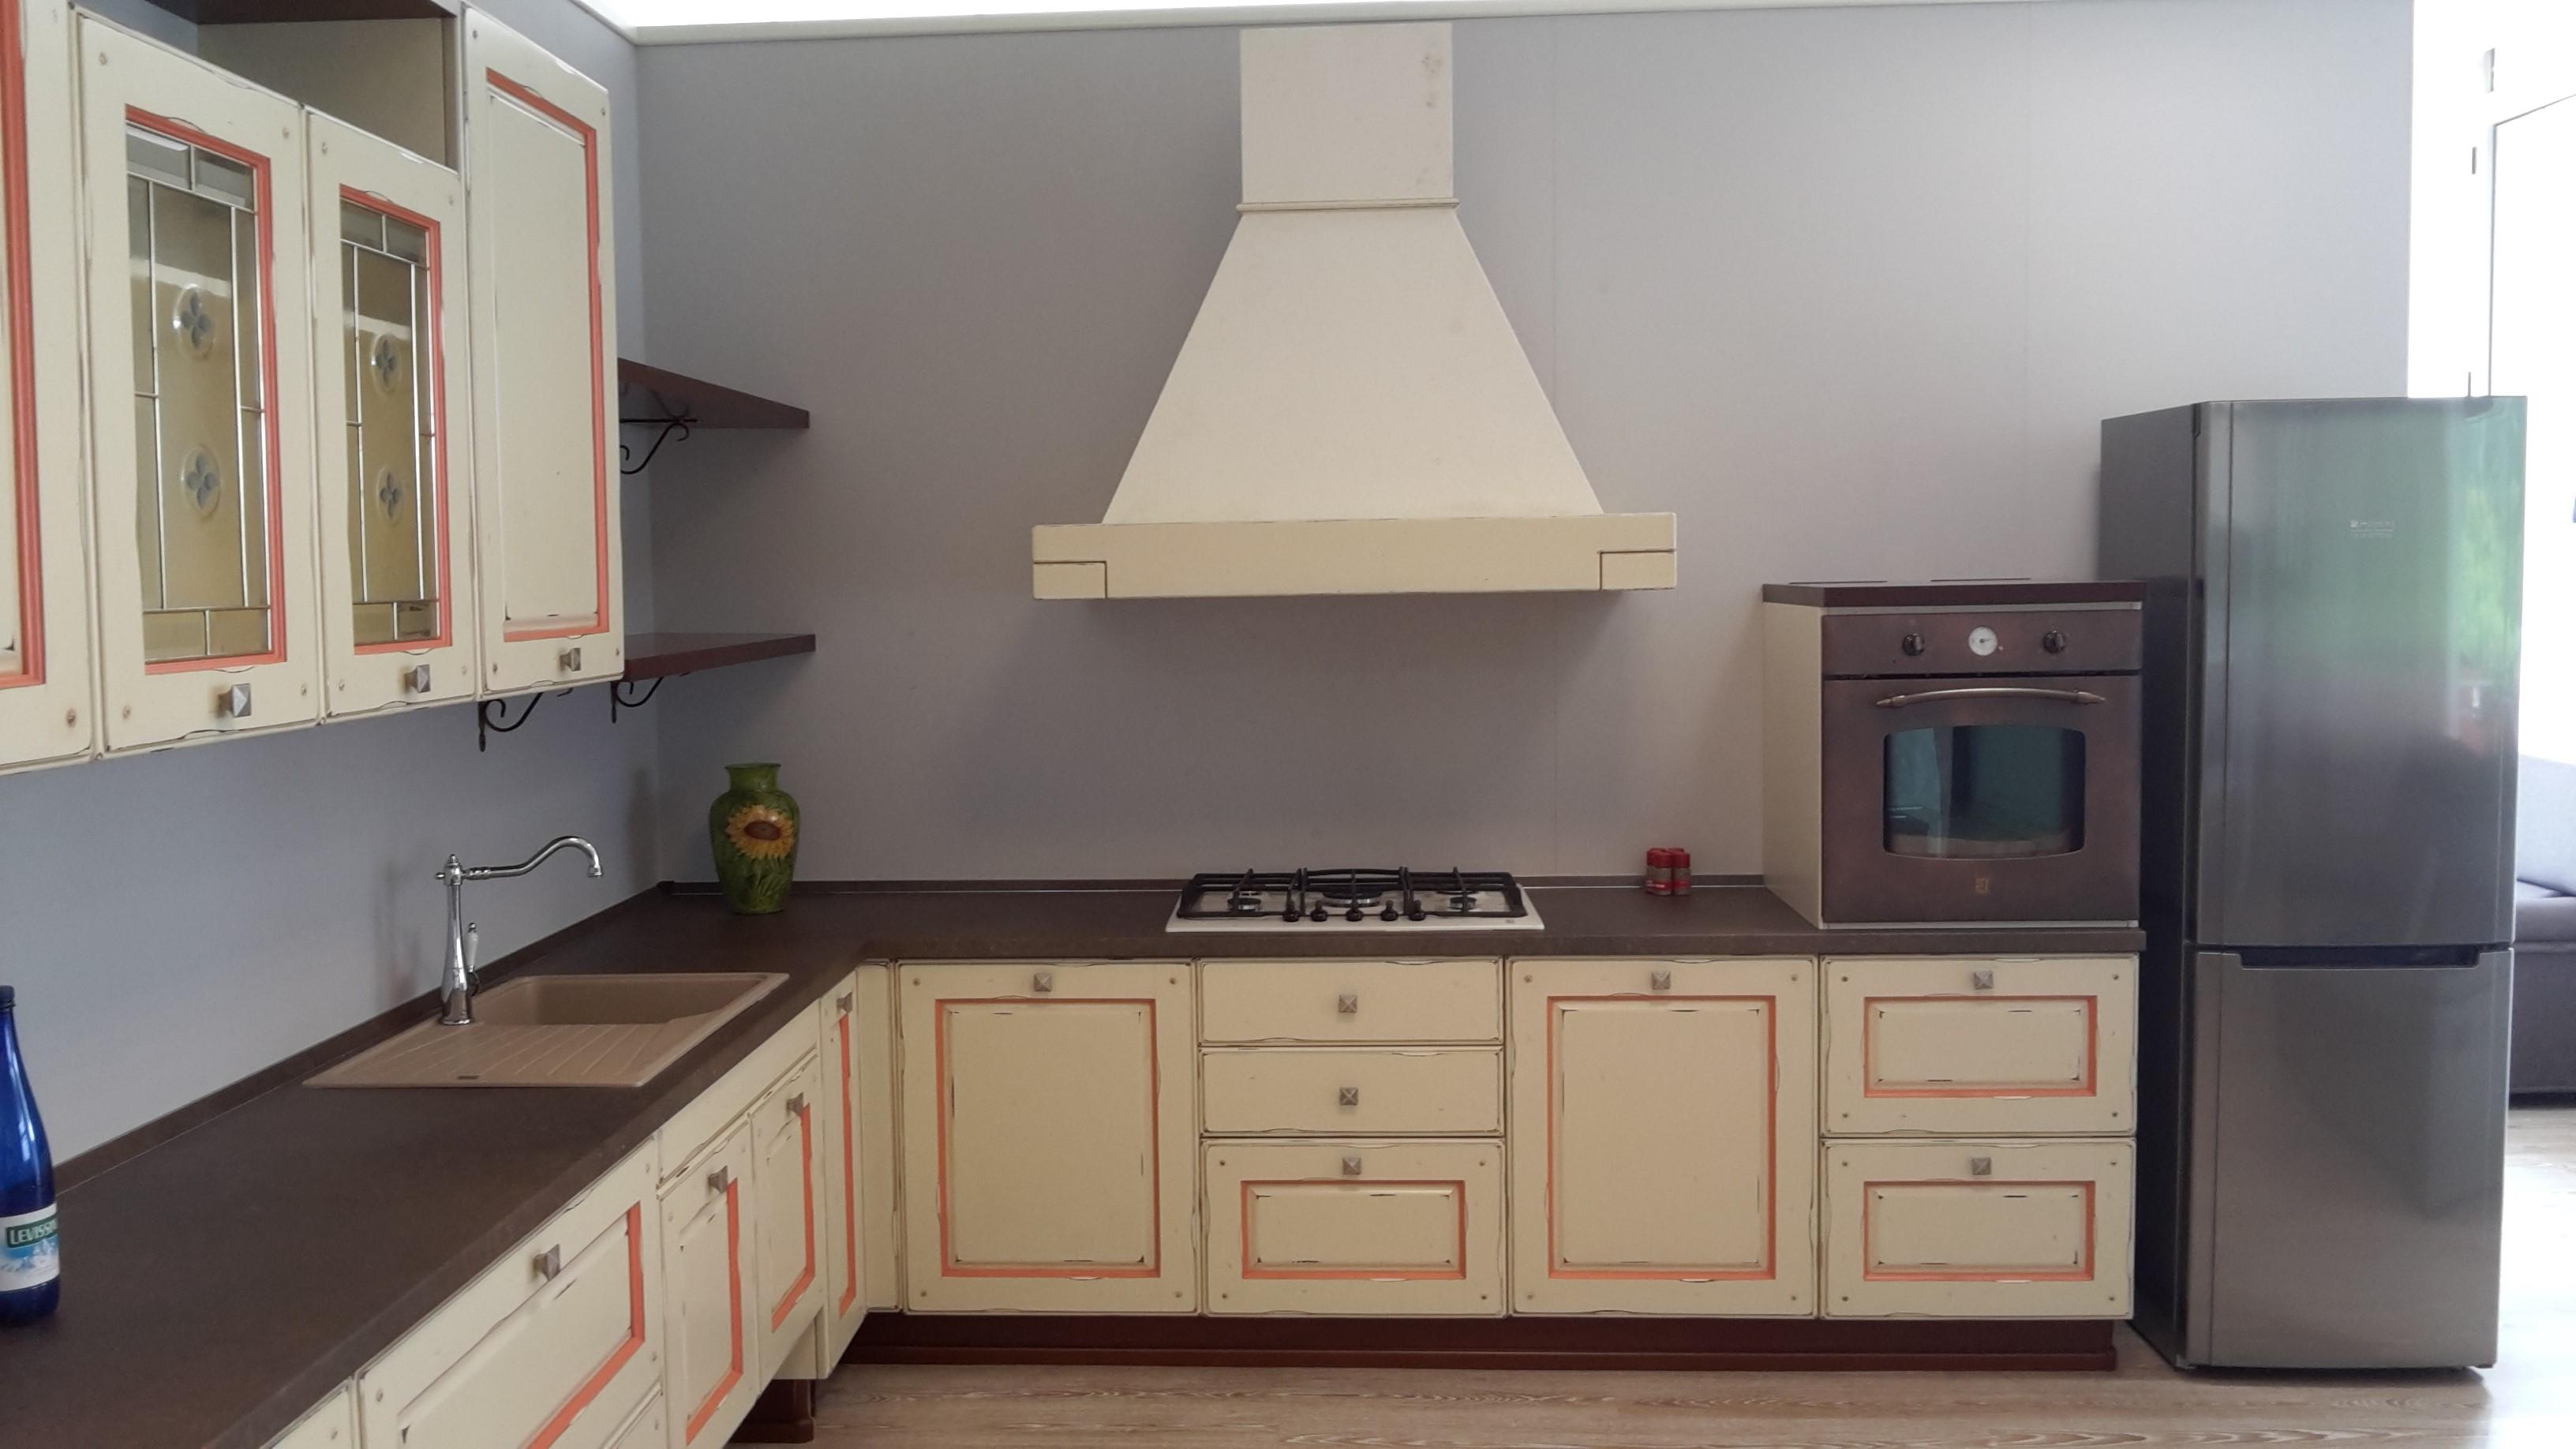 Pensili Cucina In Muratura. Camino Cucina Muratura Cerca Con Google ...